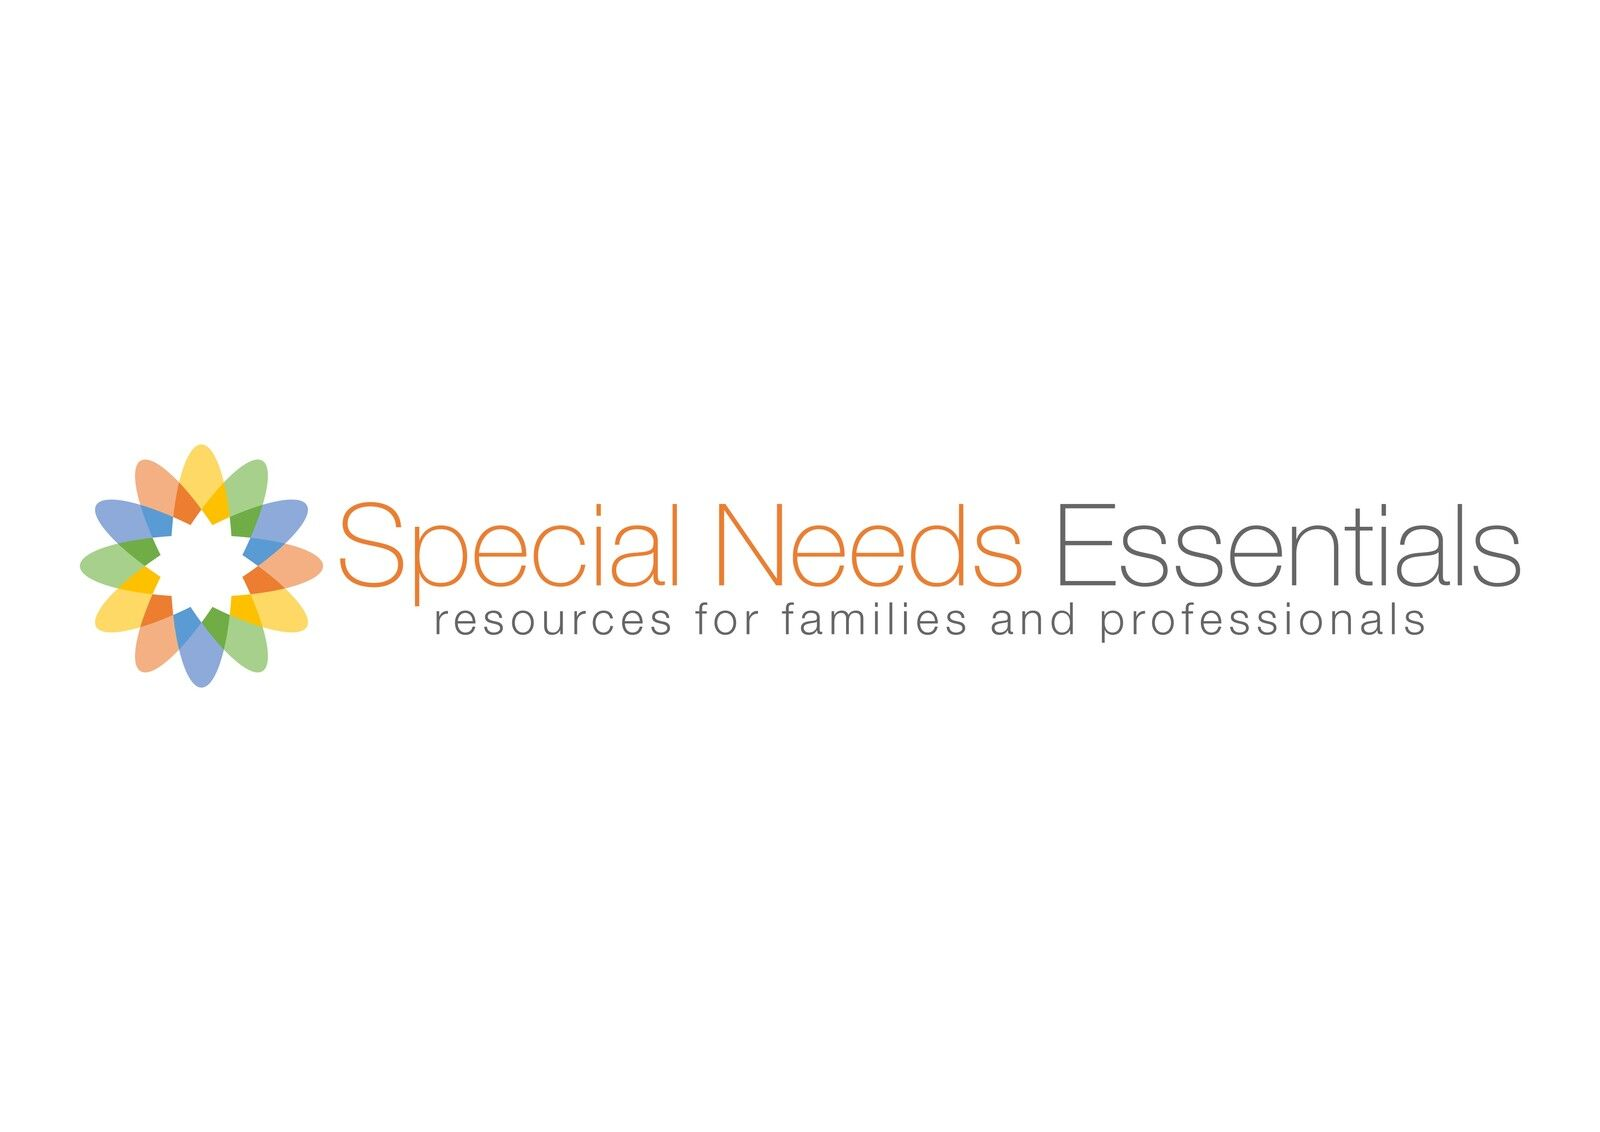 specialneedsessentials